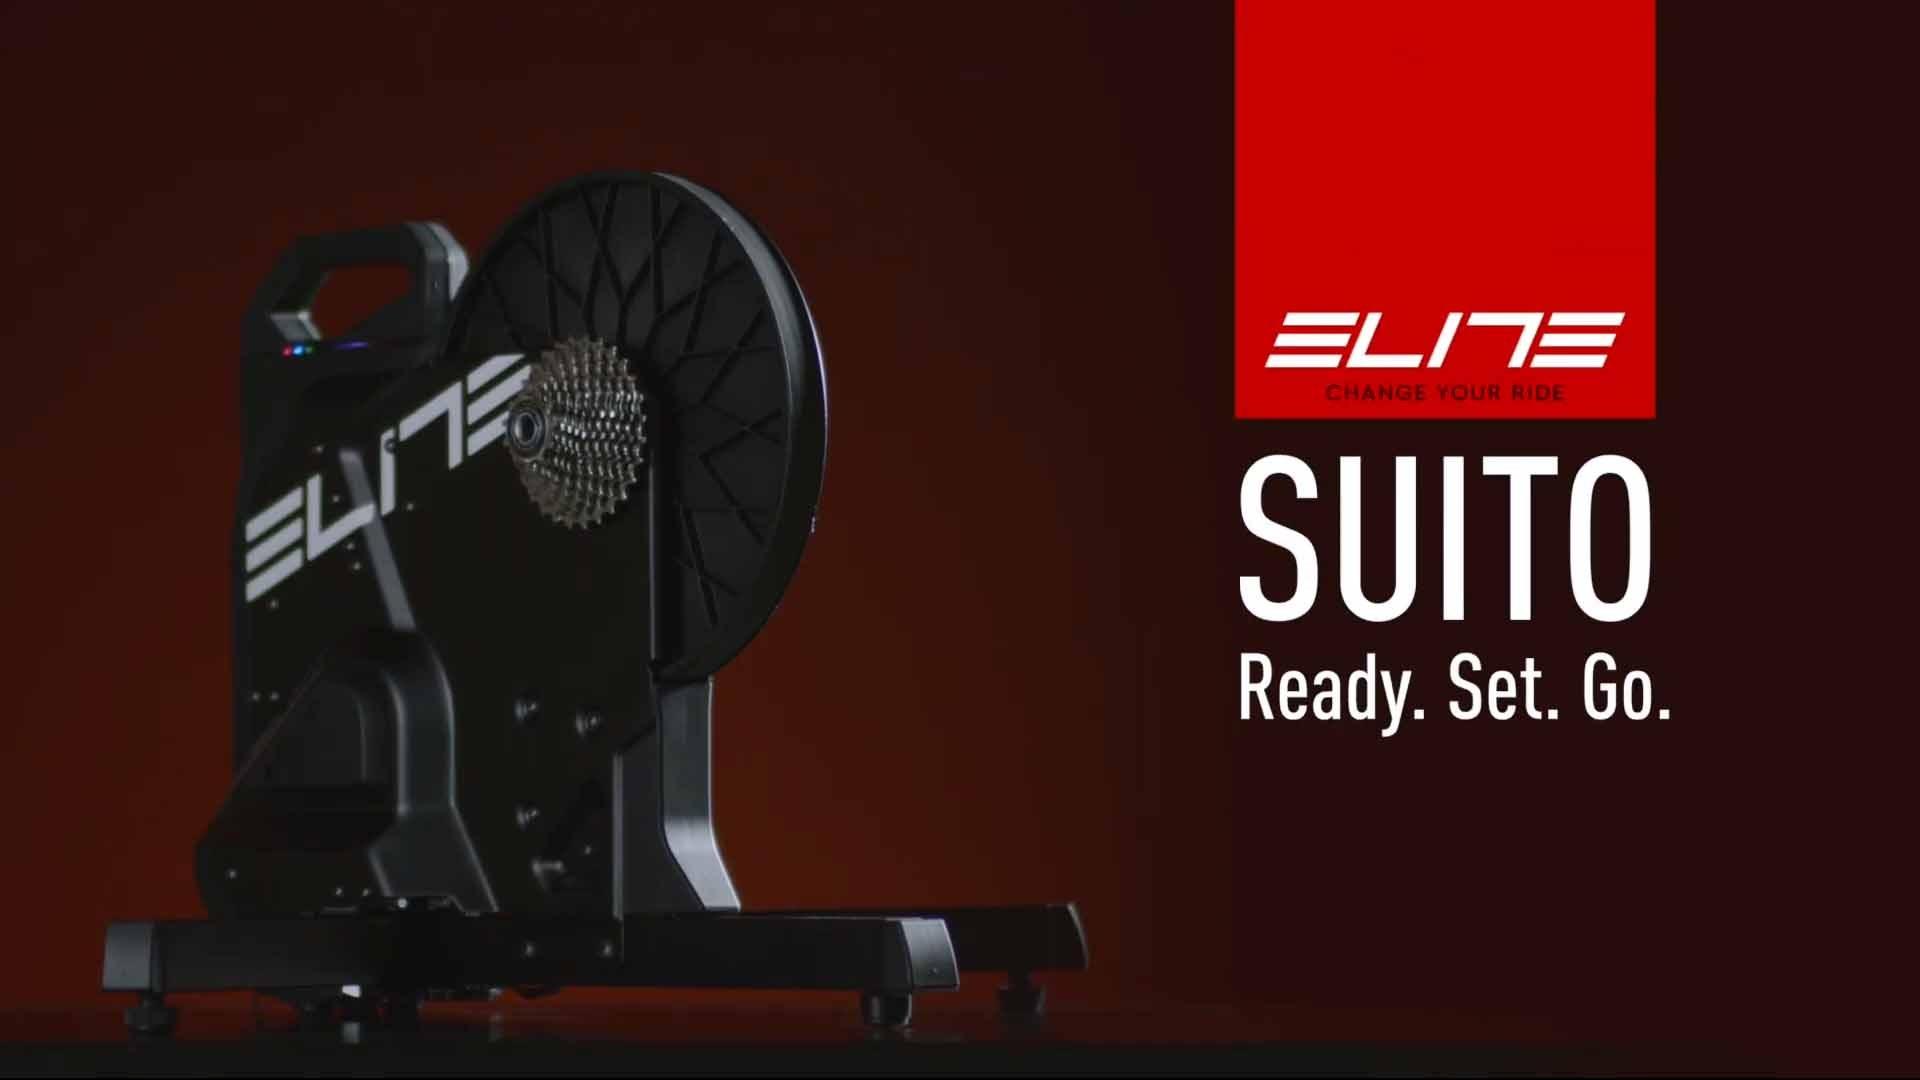 Elite SUITO. Ready. Set. Go.